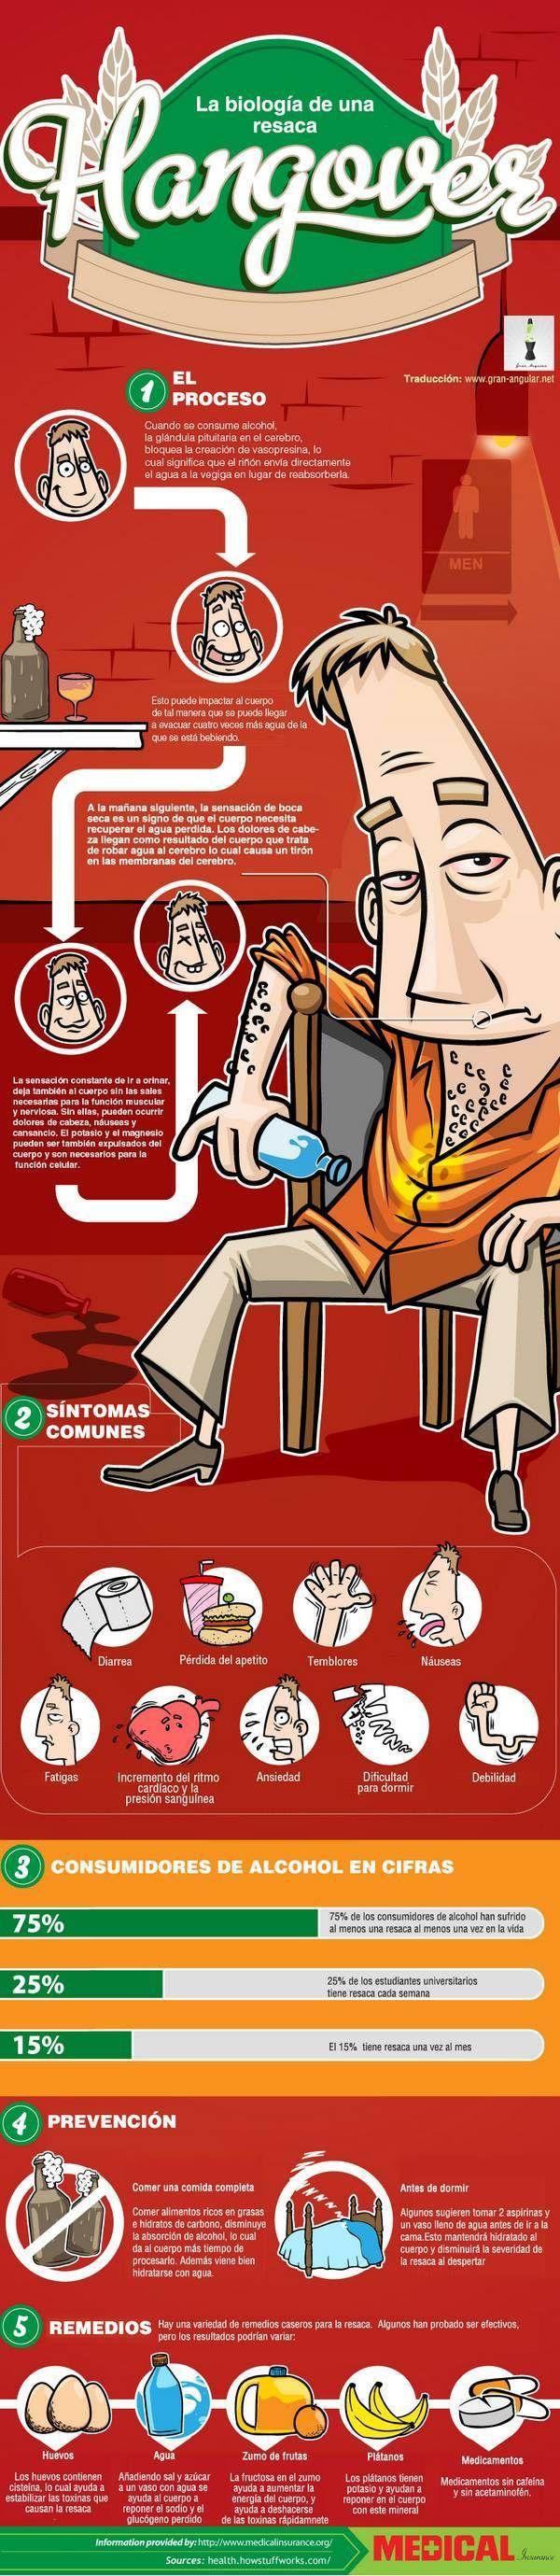 Biología de la resaca: La Resaca, Information Infographic, Daily Infographic, Hangover Cure, Biologia De, Hangover Infographic, Biology Hangover, Drinks, Biology Infographic